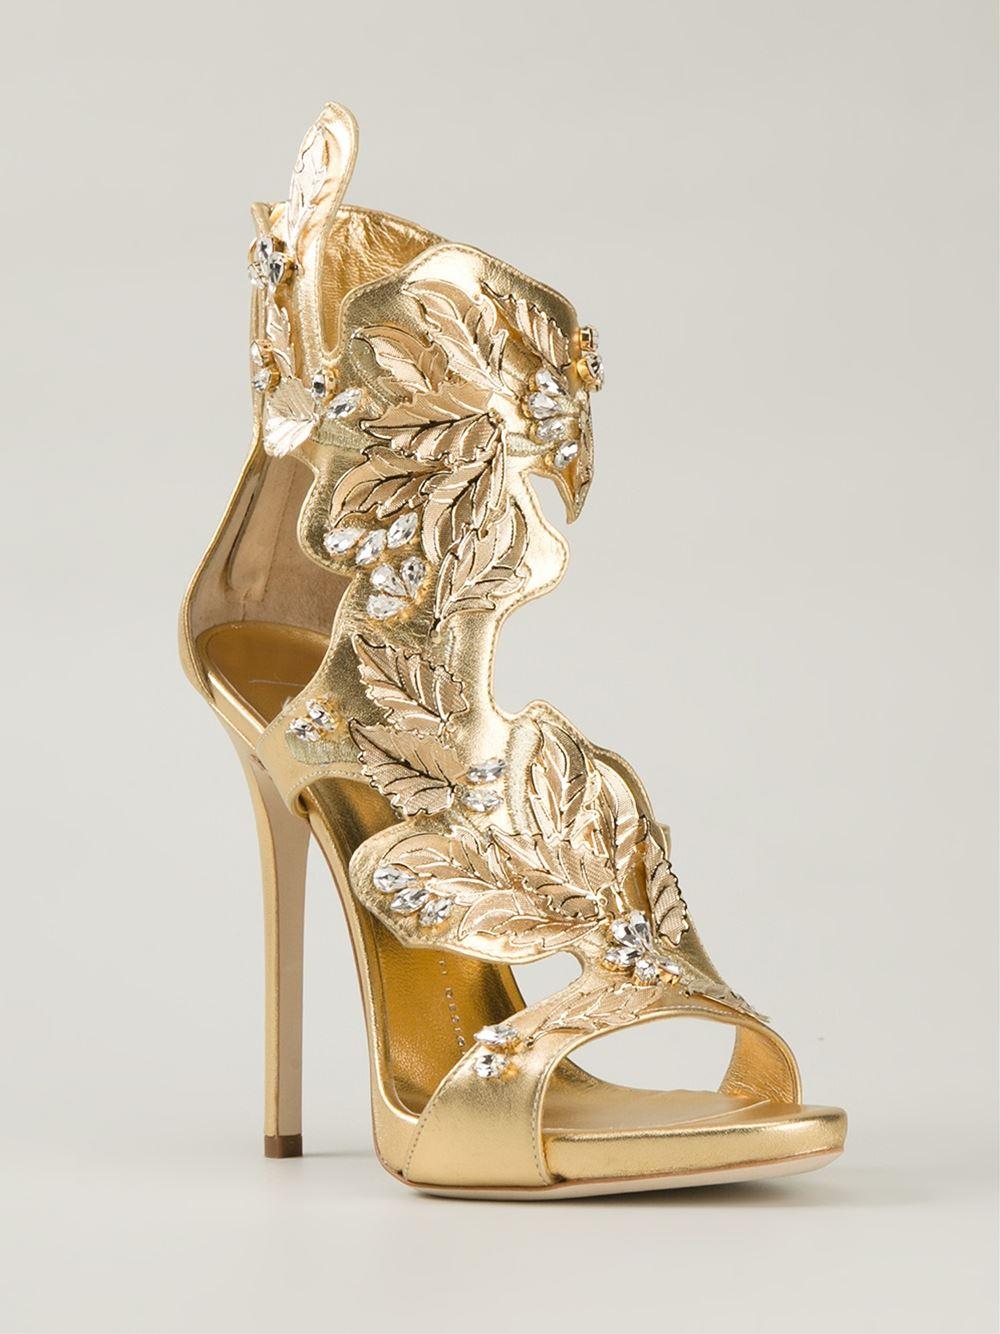 Gold Leaf Heels - Is Heel